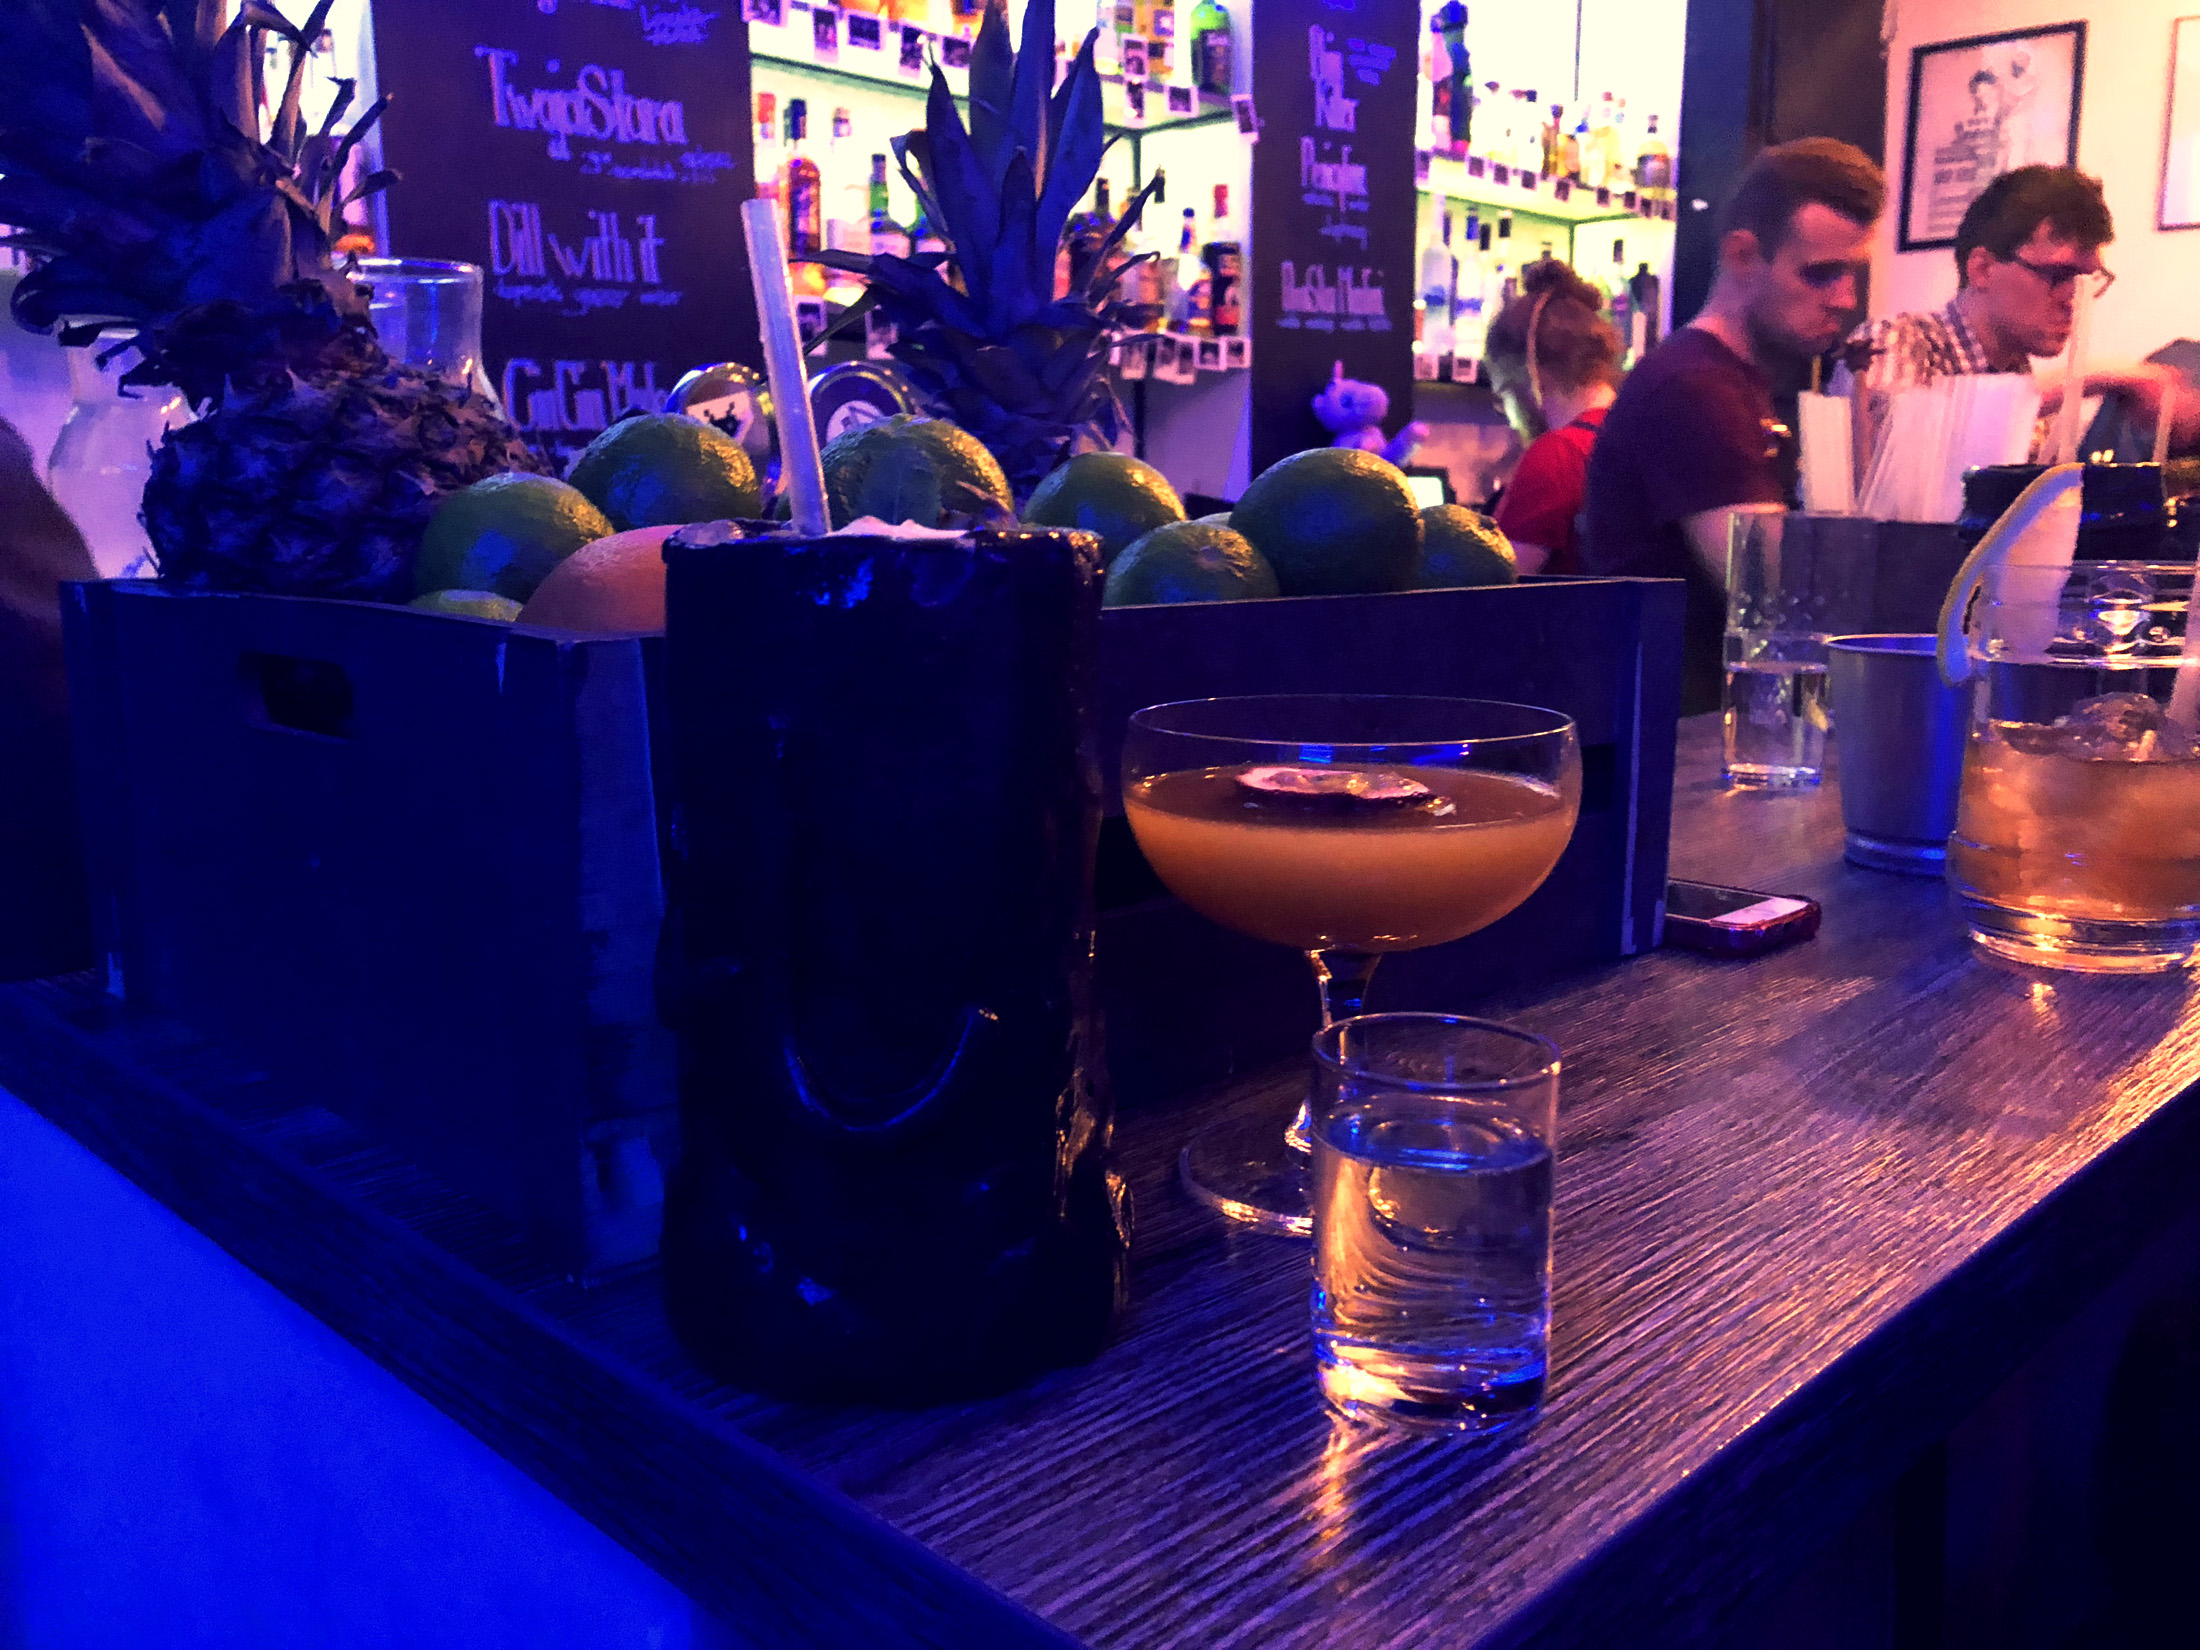 Pixel Cocktails & Fun